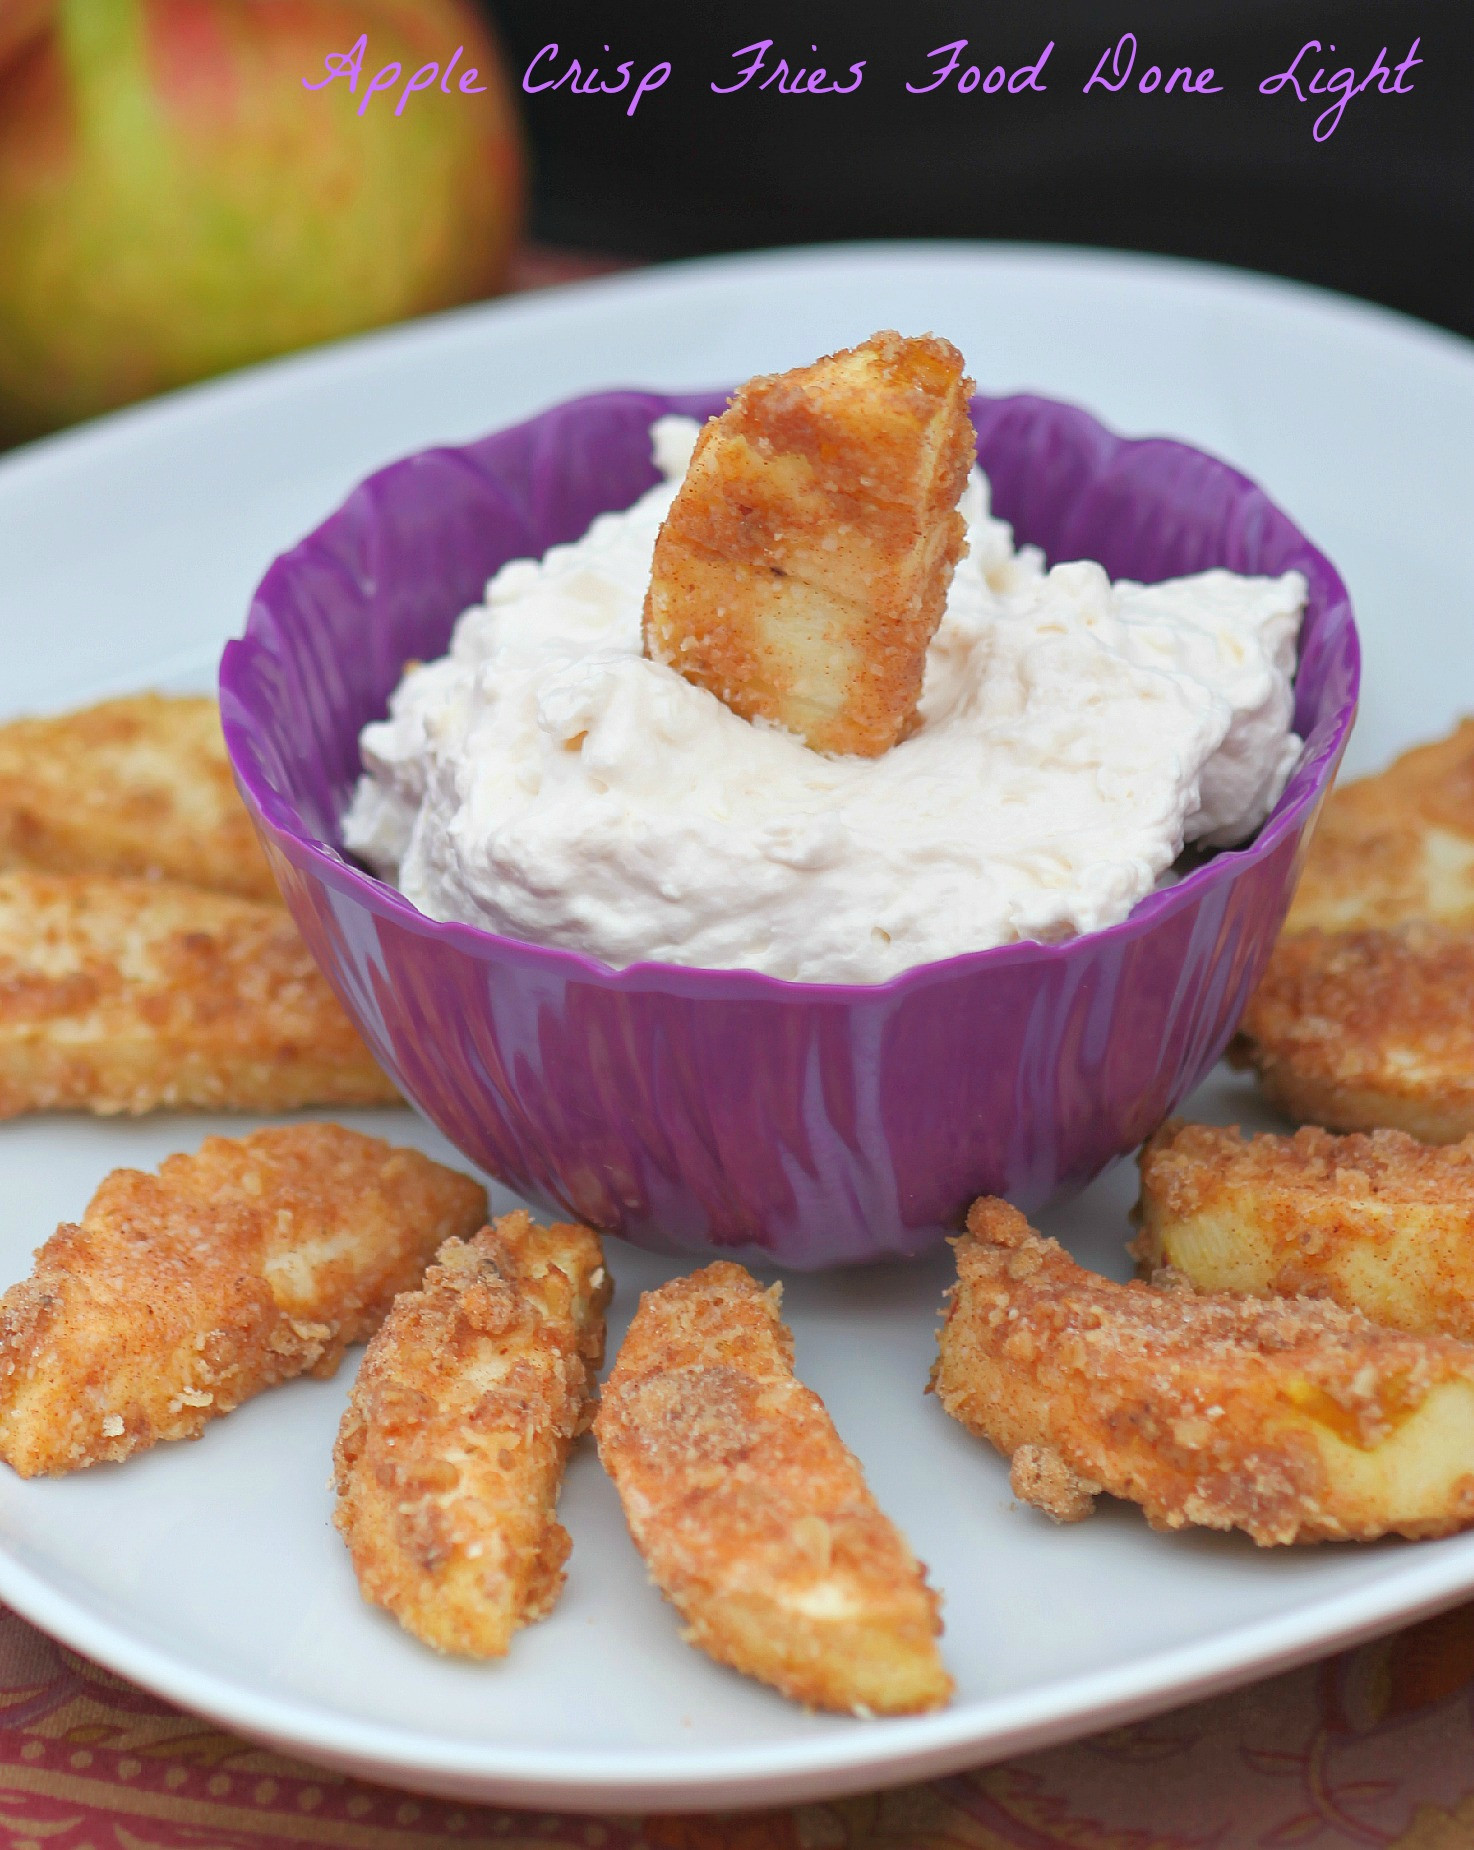 Healthy Apple Desserts  Apple Crisp Fries Healthy Low Calorie Food Done Light